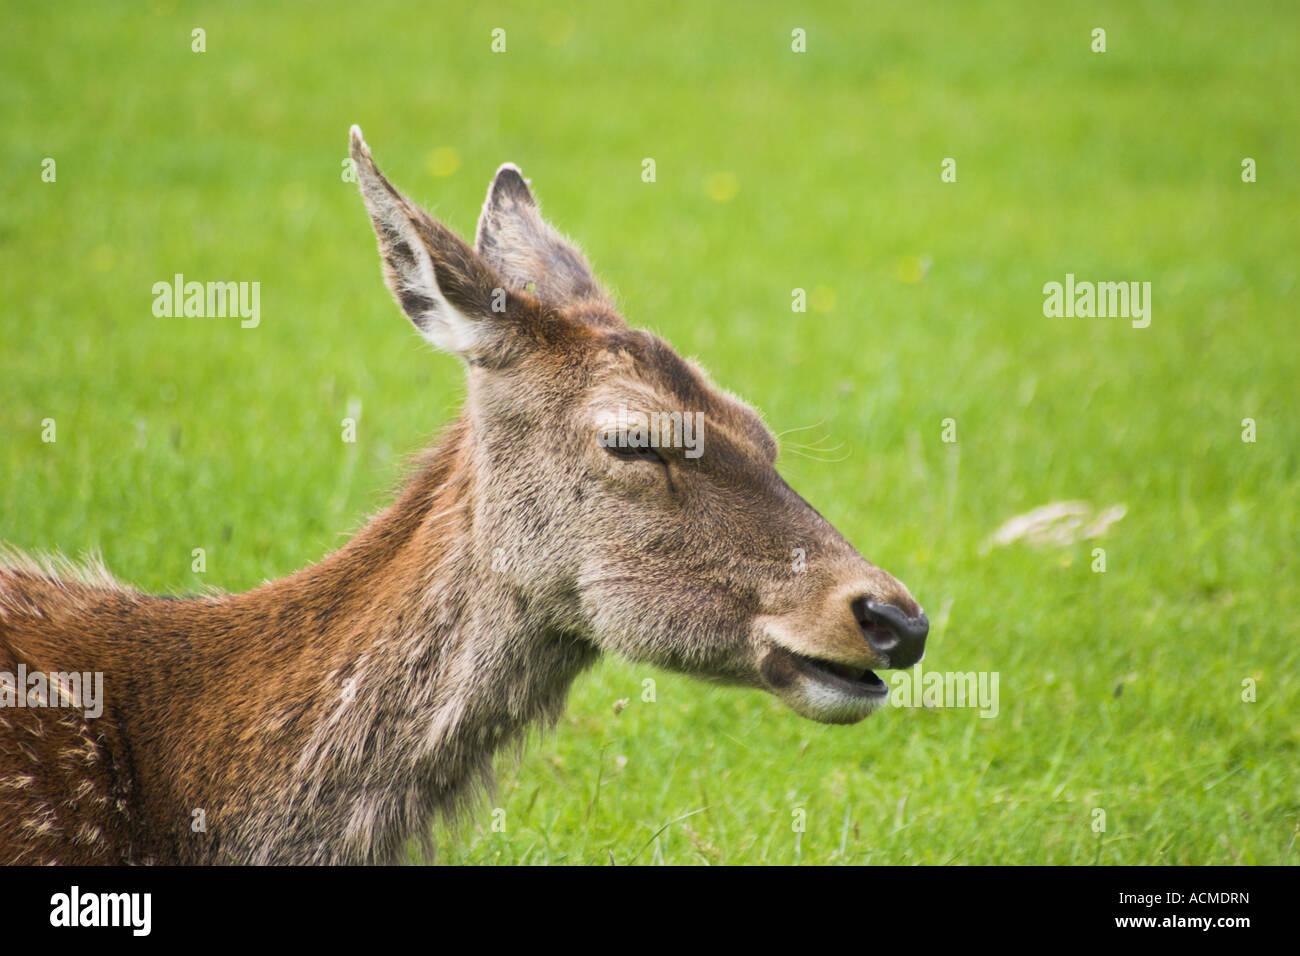 A doe a female deer Bunratty Folk Park Co Clare Ireland - Stock Image